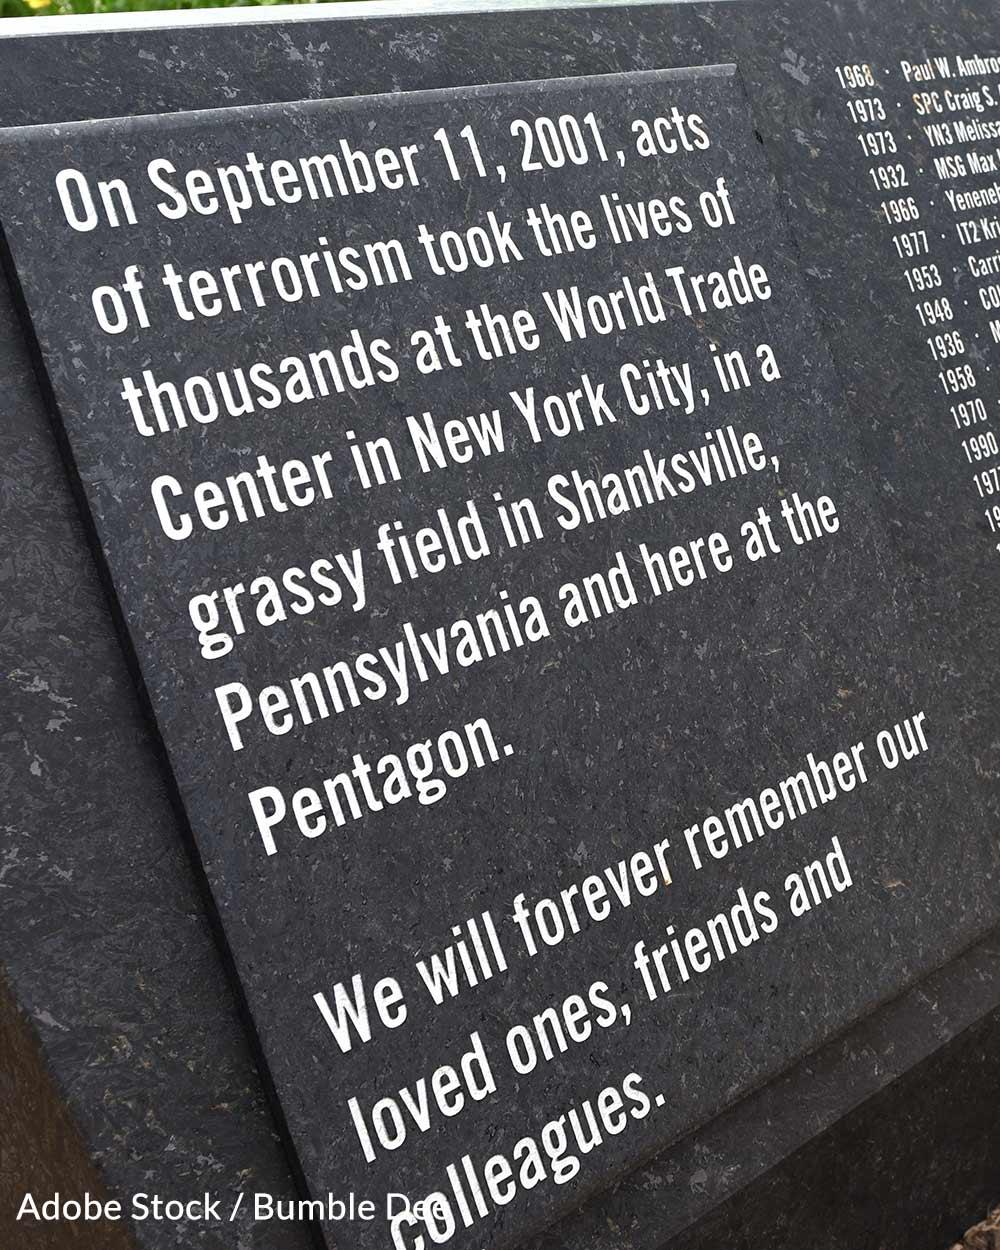 A 9/11 memorial at the Pentagon.